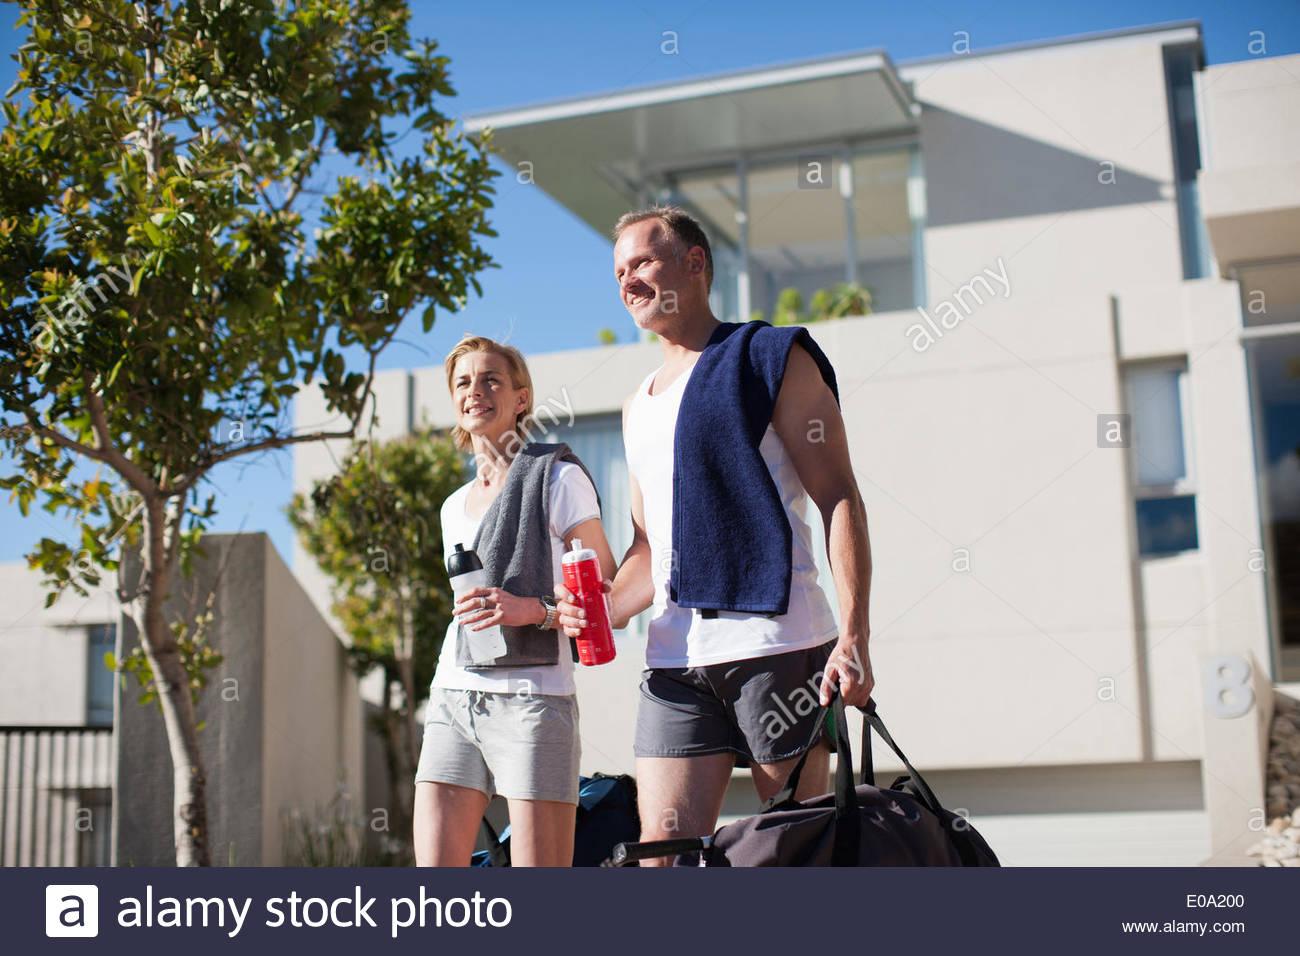 Älteres Paar in Trainingskleidung Stockbild